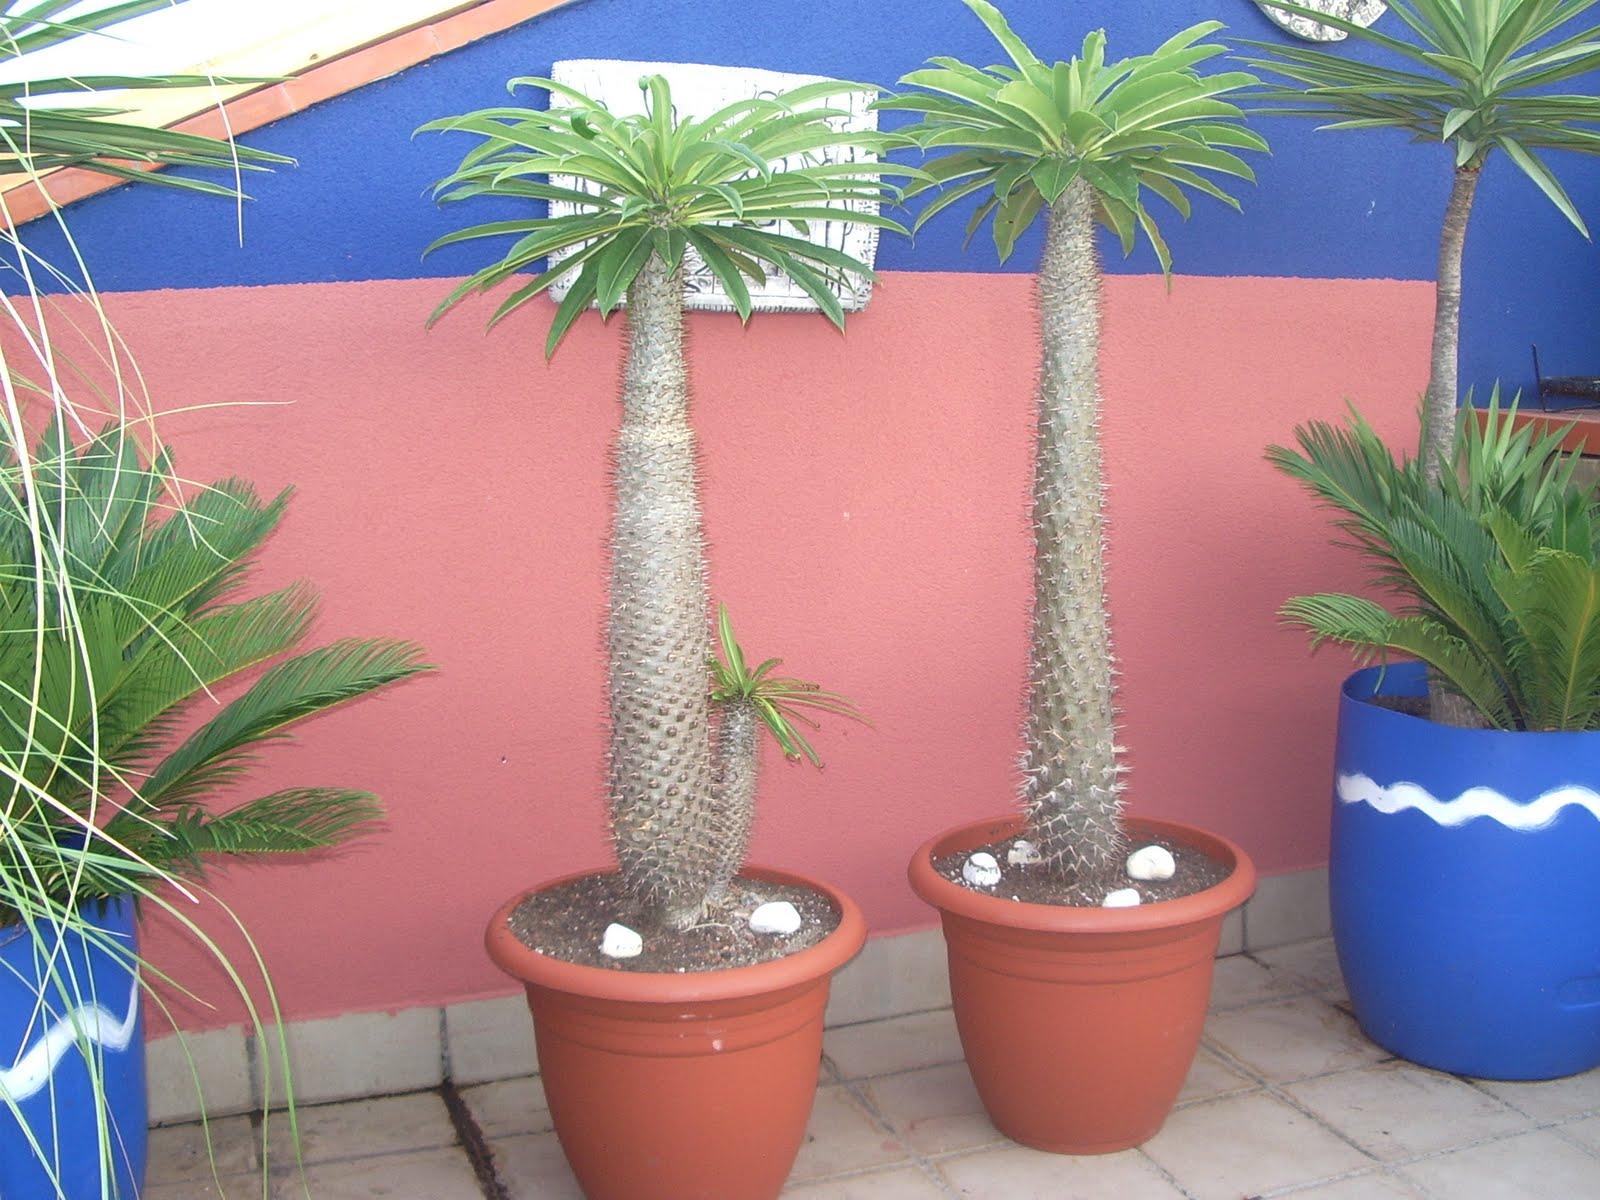 Un jardin en macetas pachipodium lamerei for Jardin que planter en janvier